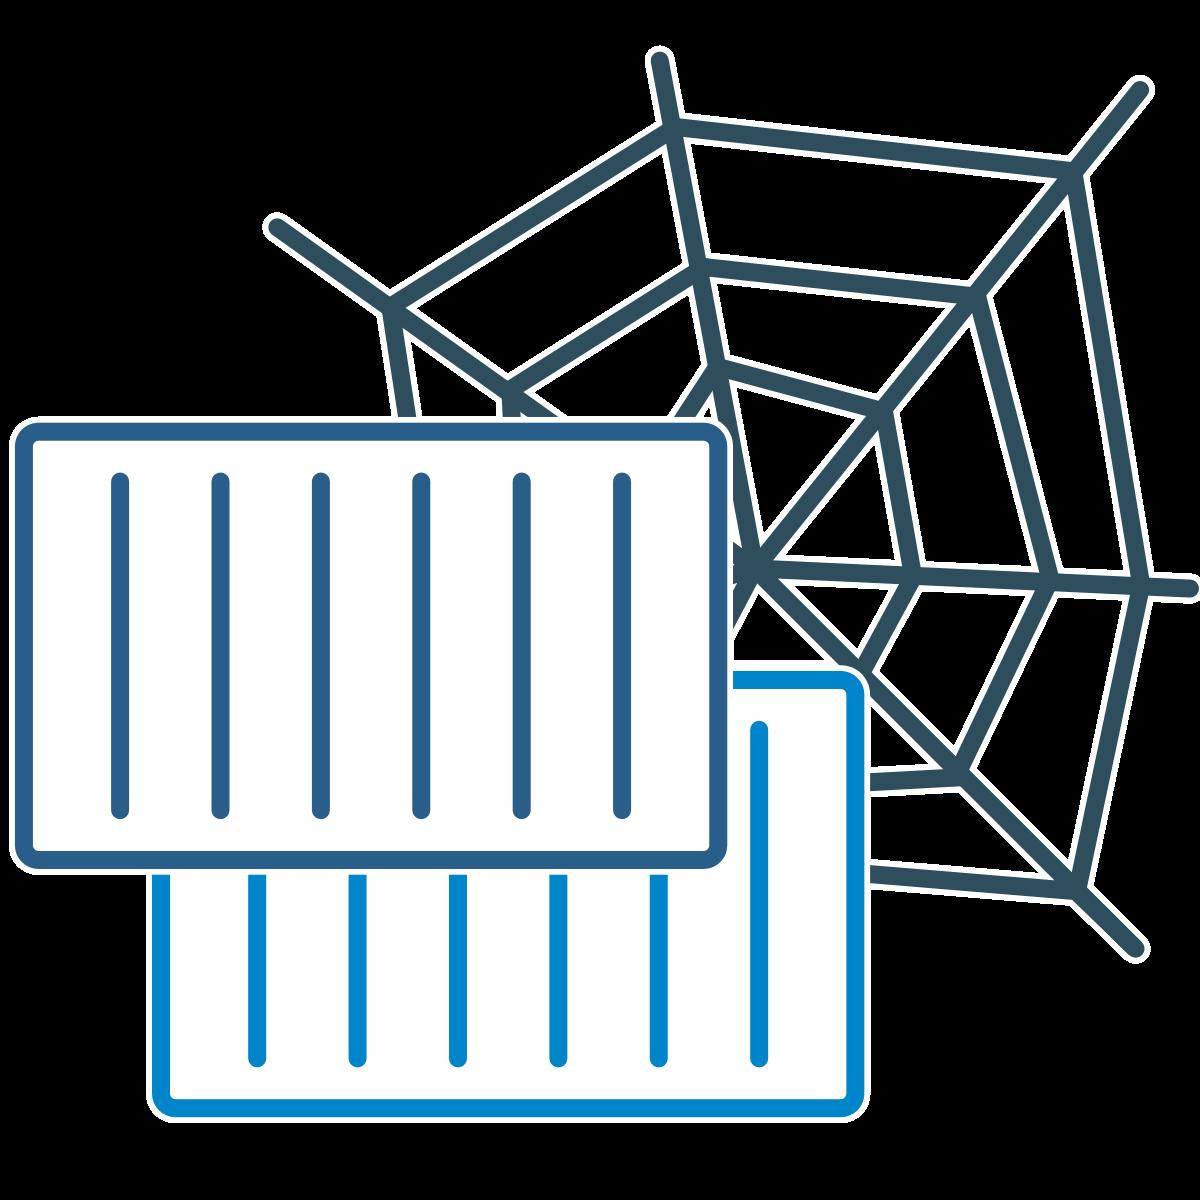 open source network emulator for windows